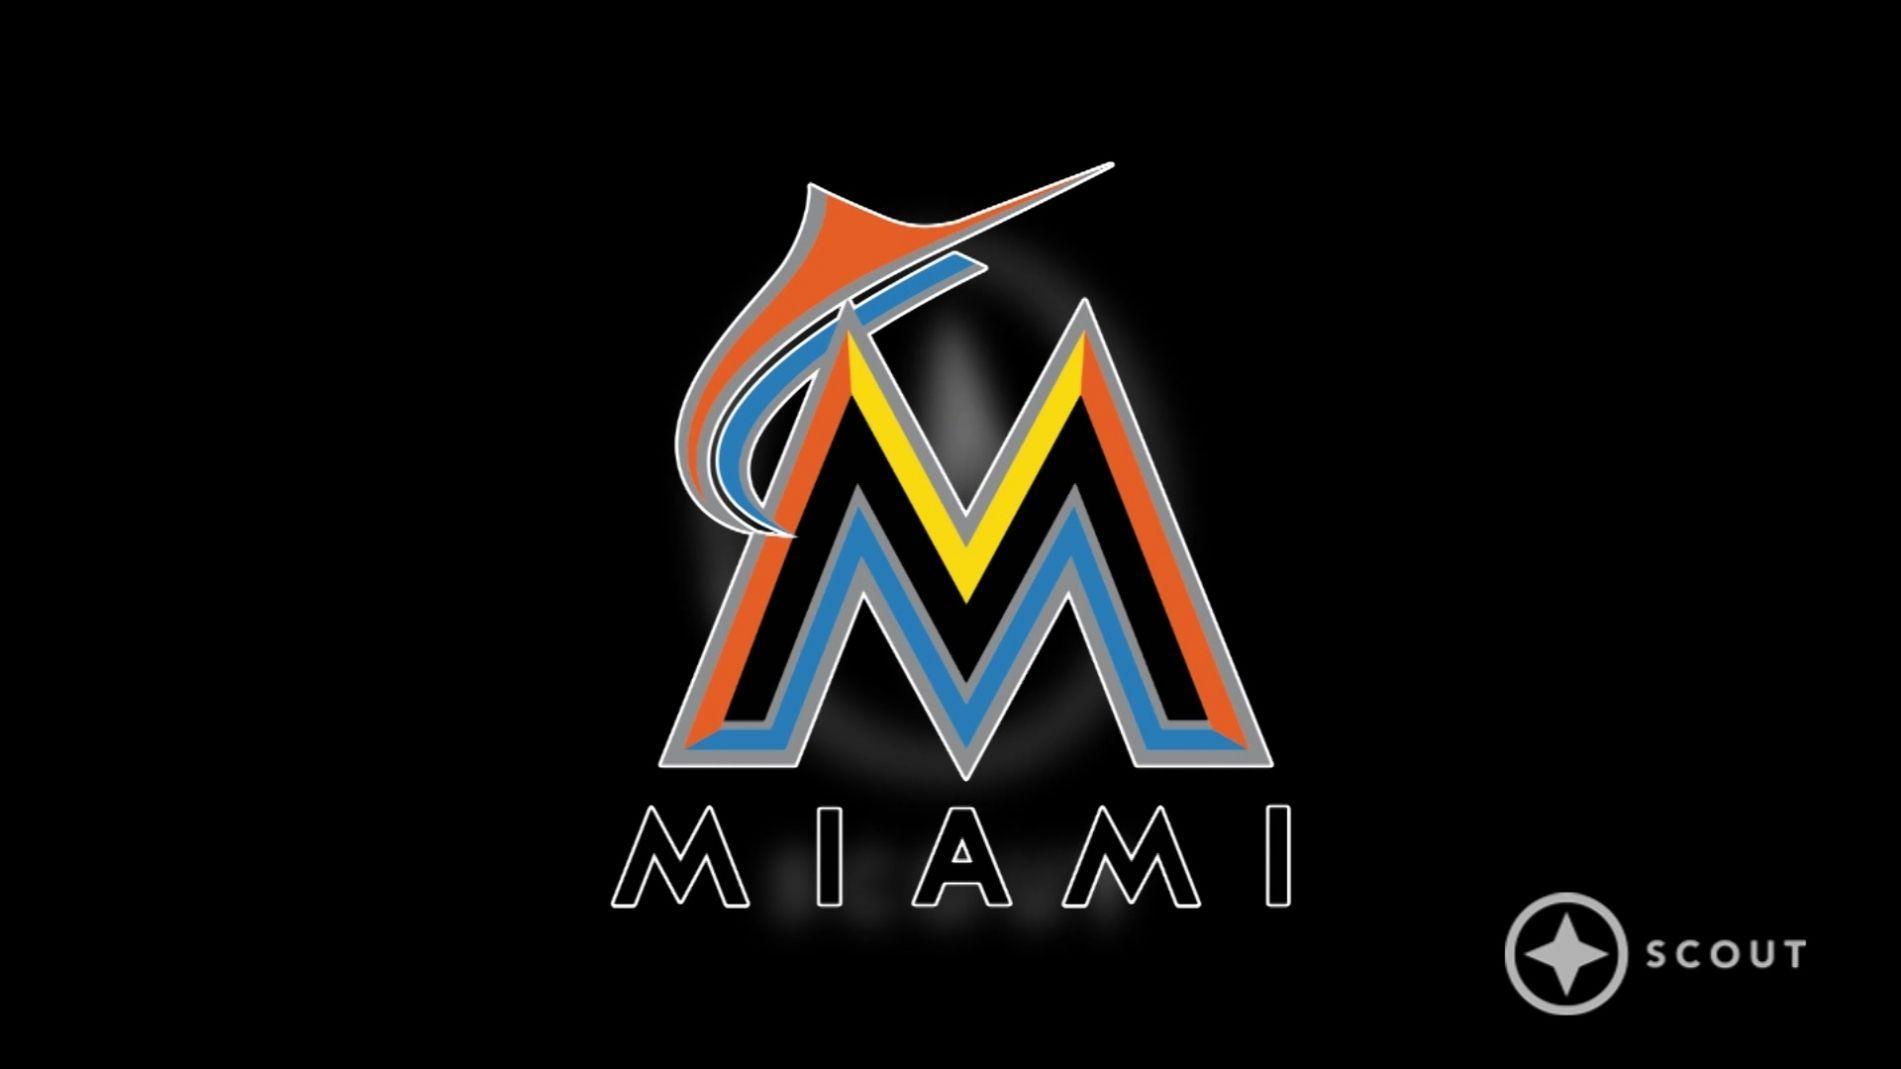 Miami Marlins Image Throughout Wallpaper